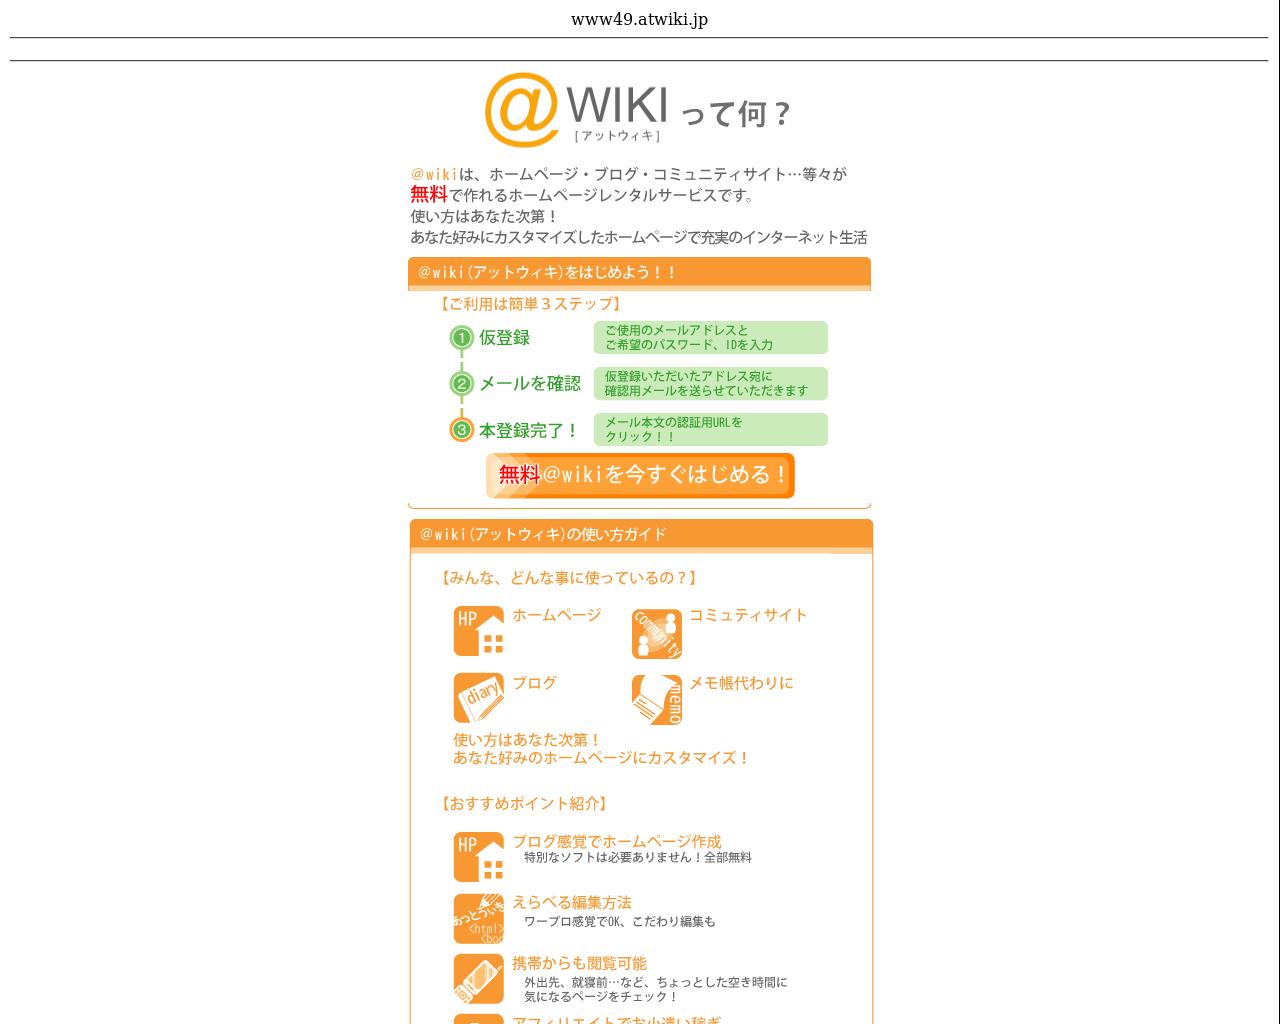 www49.atwiki.jp(2017/12/14 01:15:39)